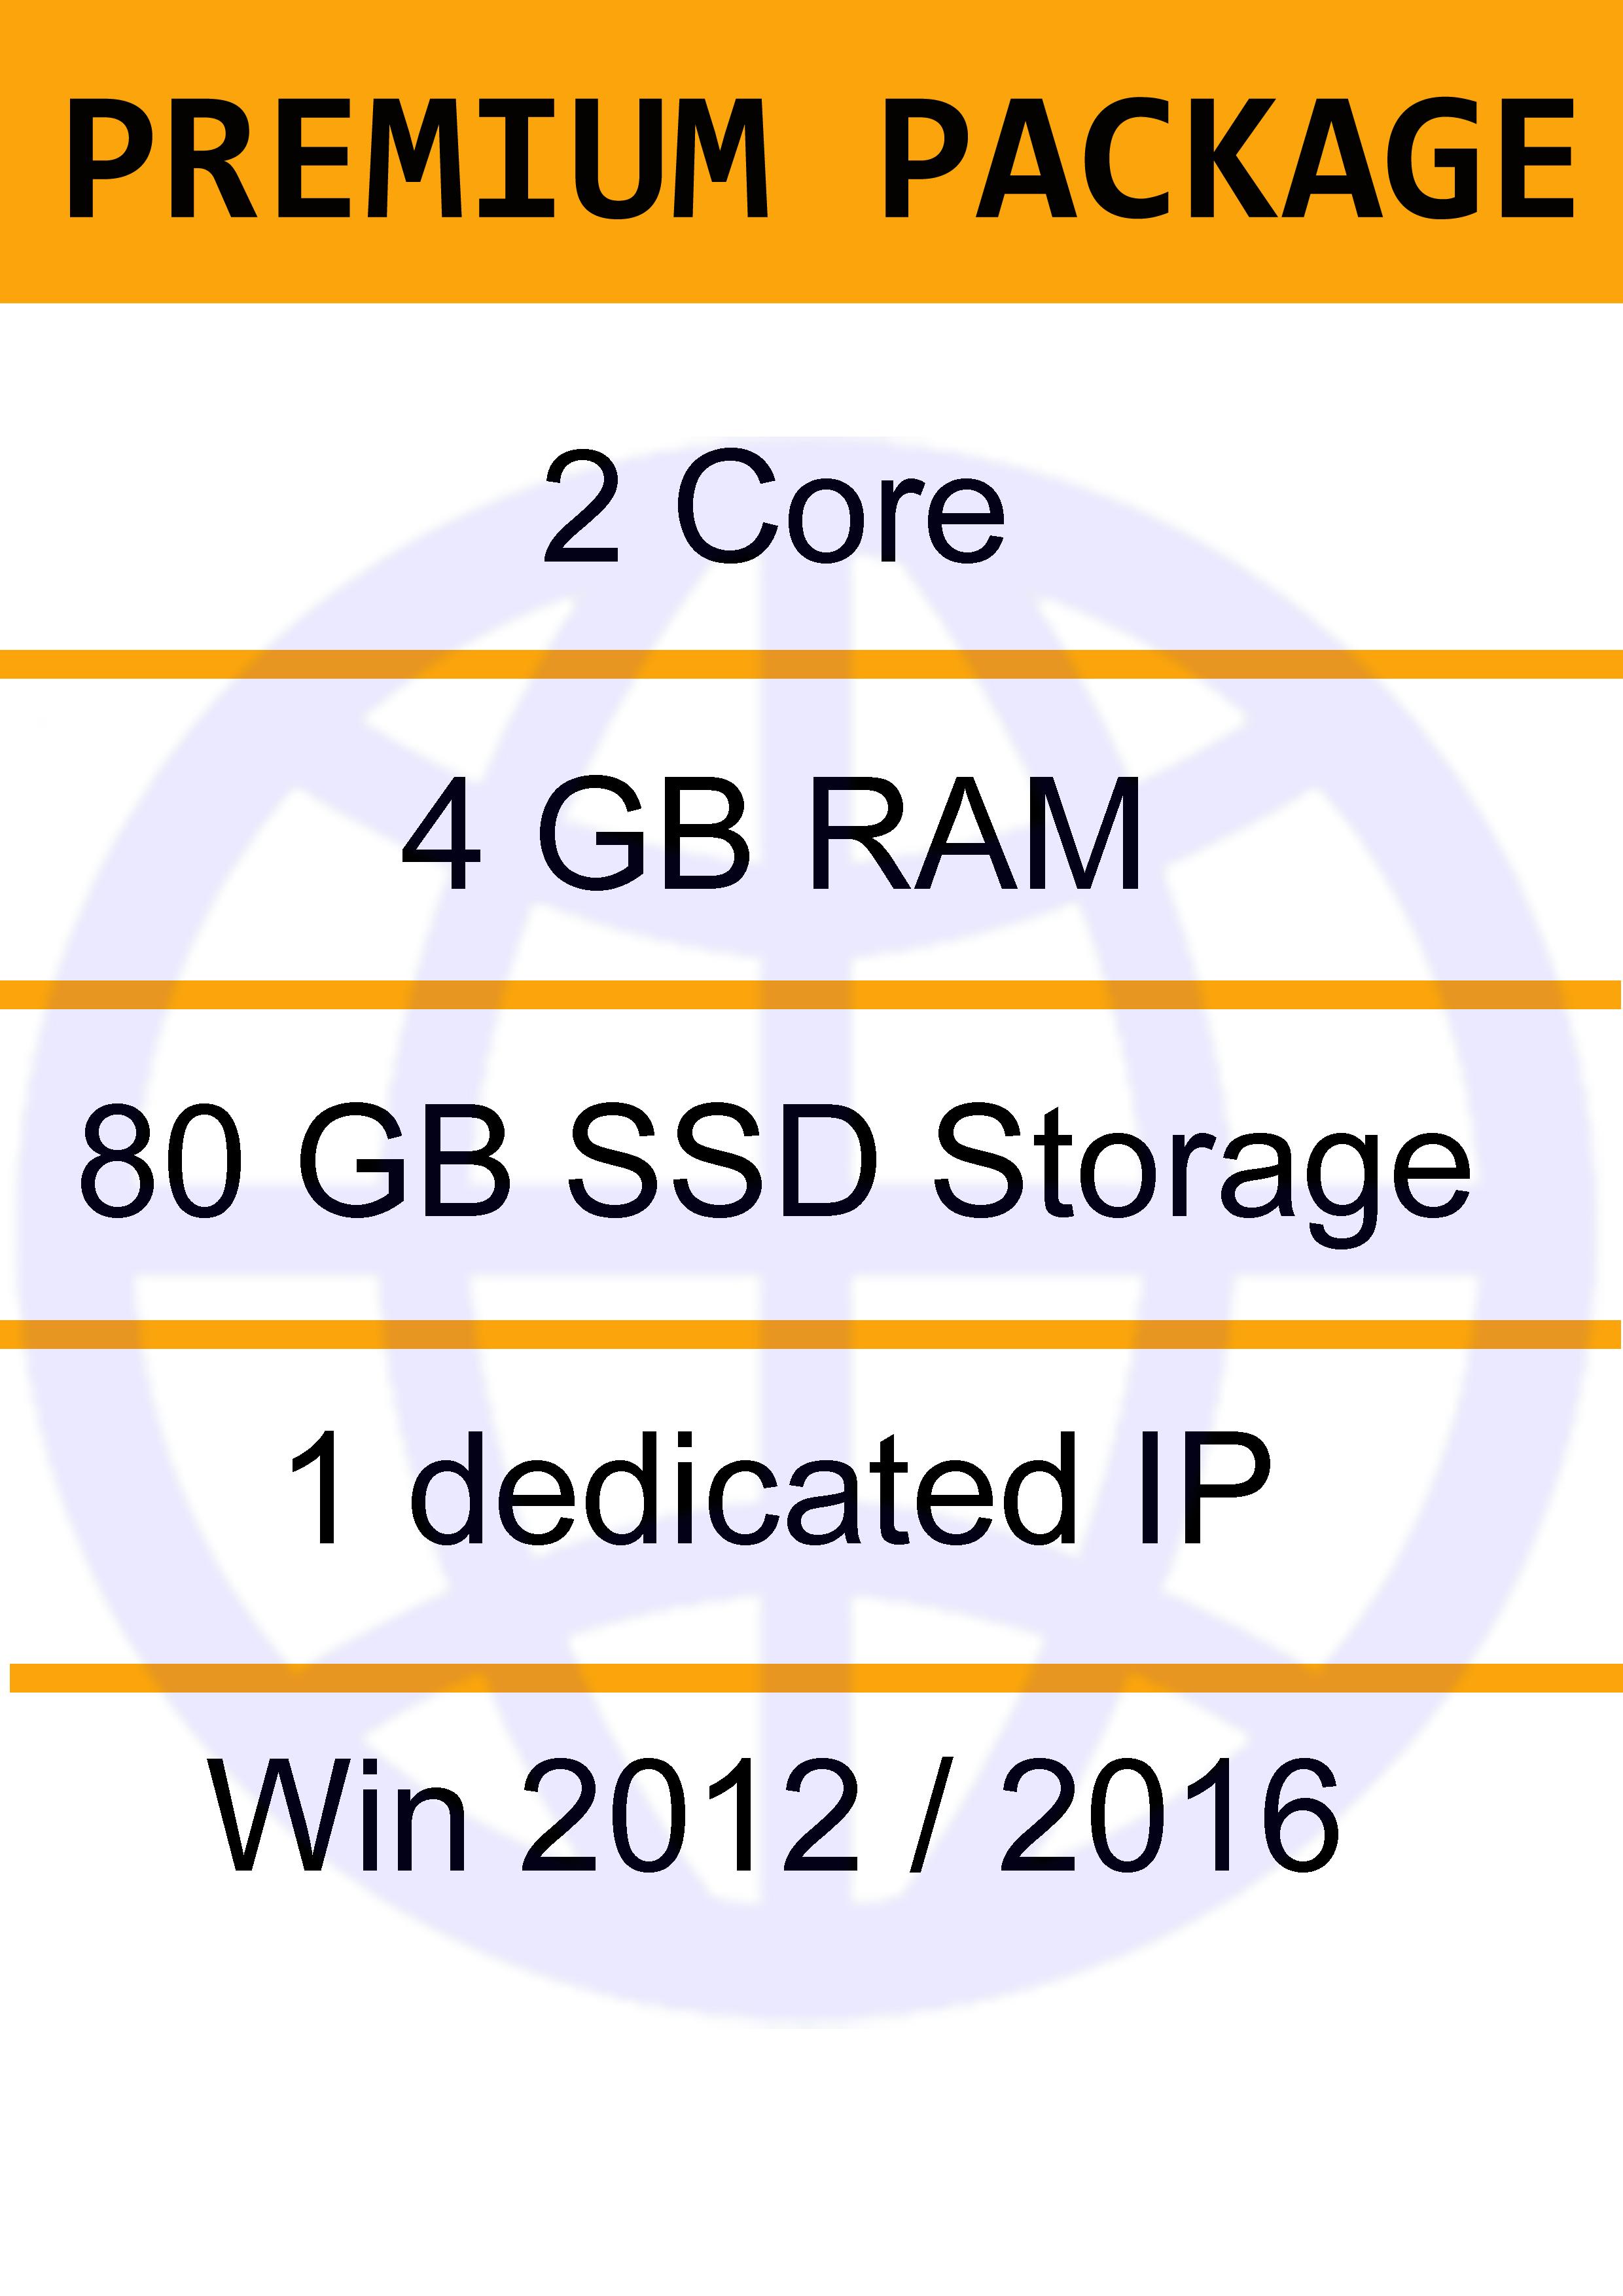 Windows VPS 4 GB - 2 Vcore - 80GB SSD - Unlimited Bandwidth